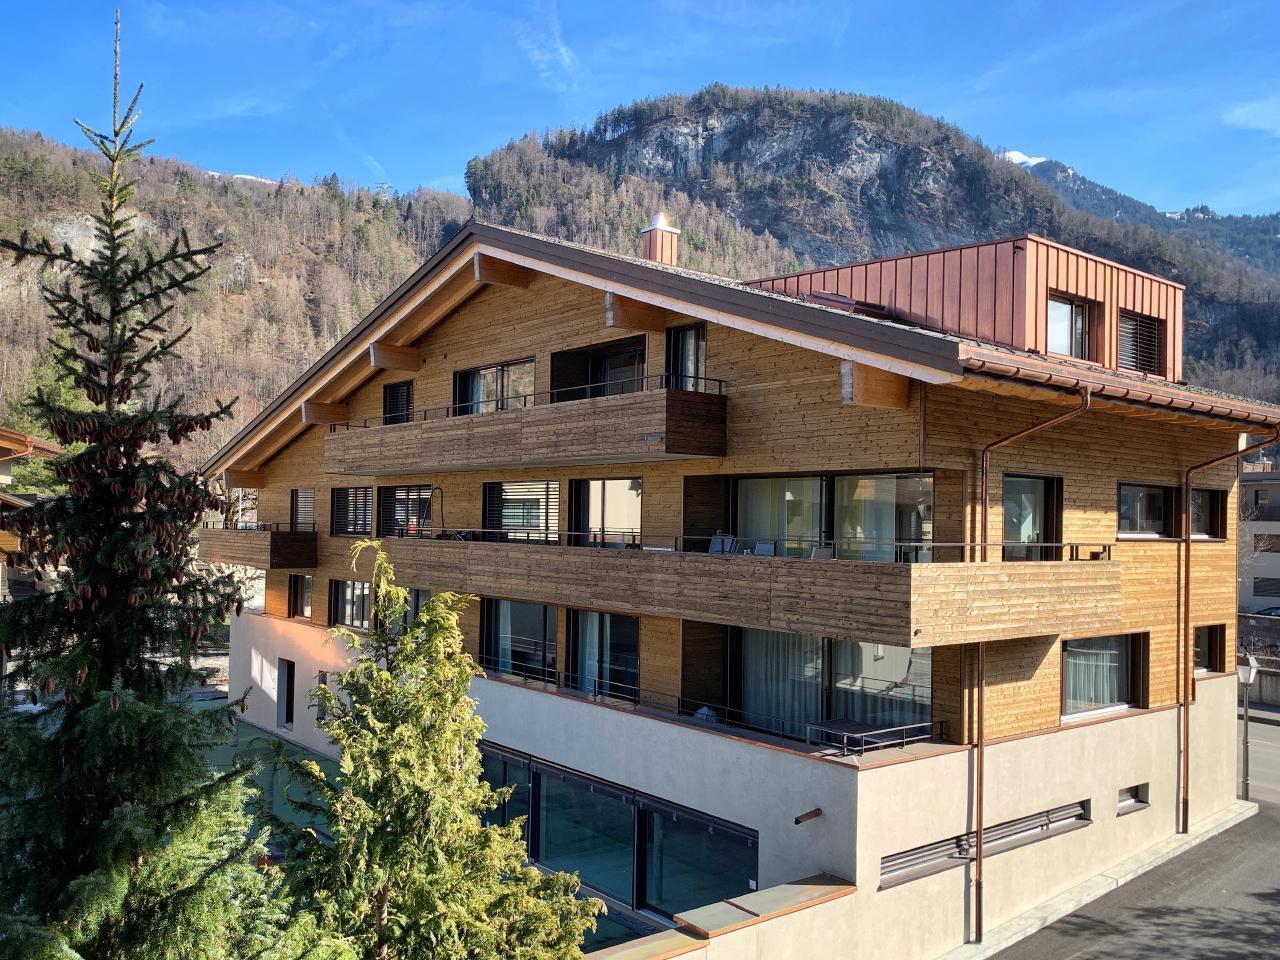 Ferienwohnung Mountain 4U (2605720), Meiringen, Meiringen - Hasliberg, Berner Oberland, Schweiz, Bild 17